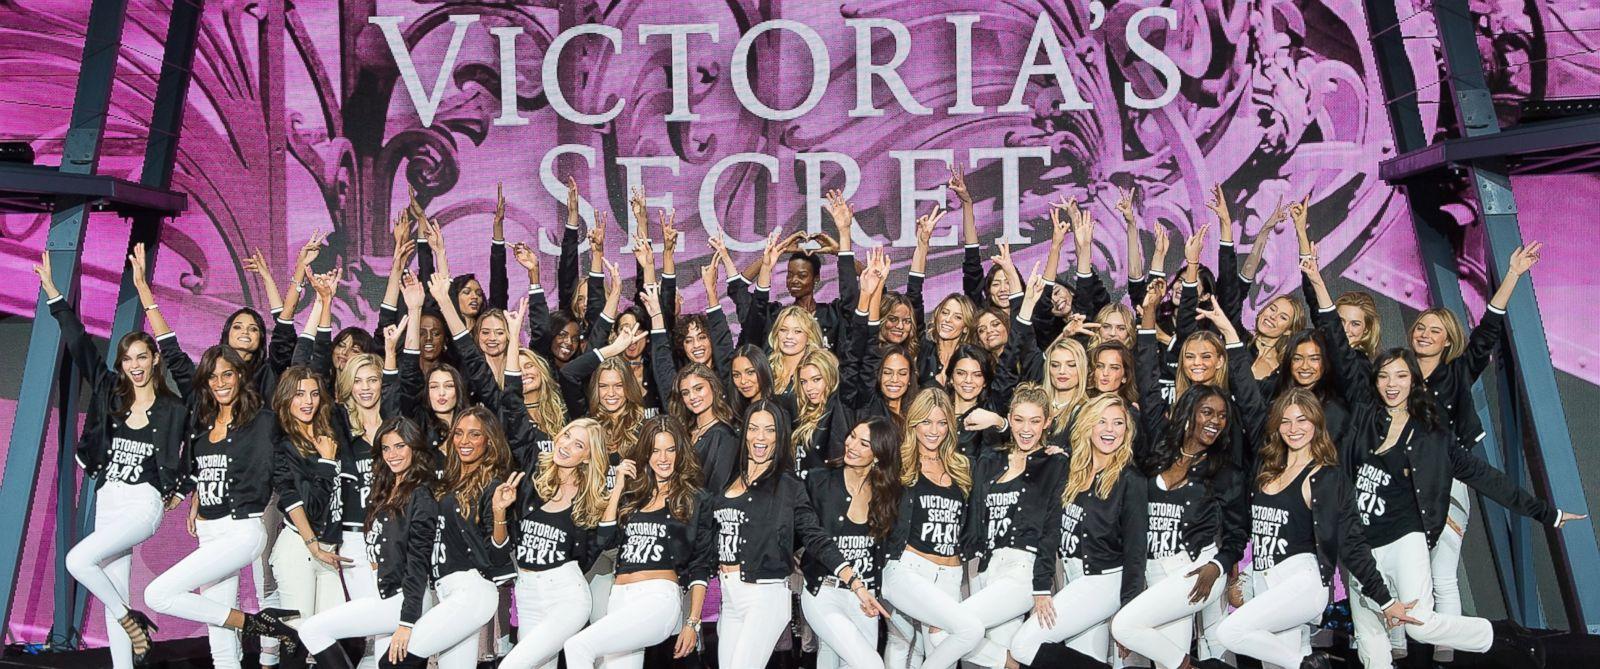 PHOTO: Victorias Secret models pose during a photocall at Le Grand Palais, Nov. 28, 2016, in Paris.